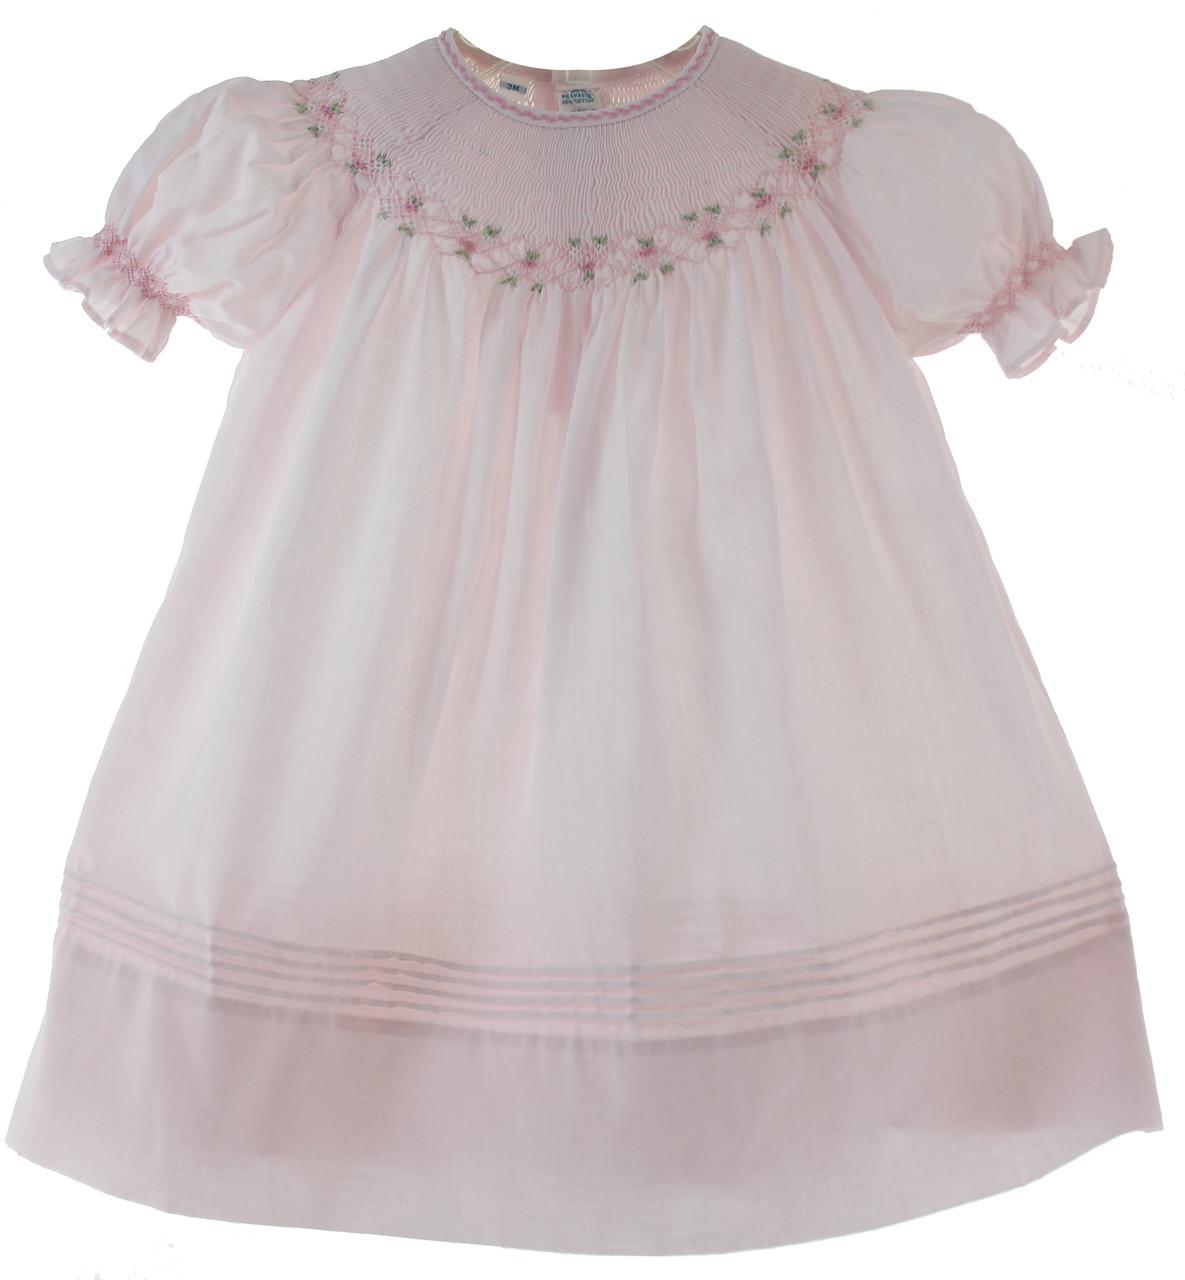 381234b918d8 Feltman Brothers Pink Smocked Bishop Dress